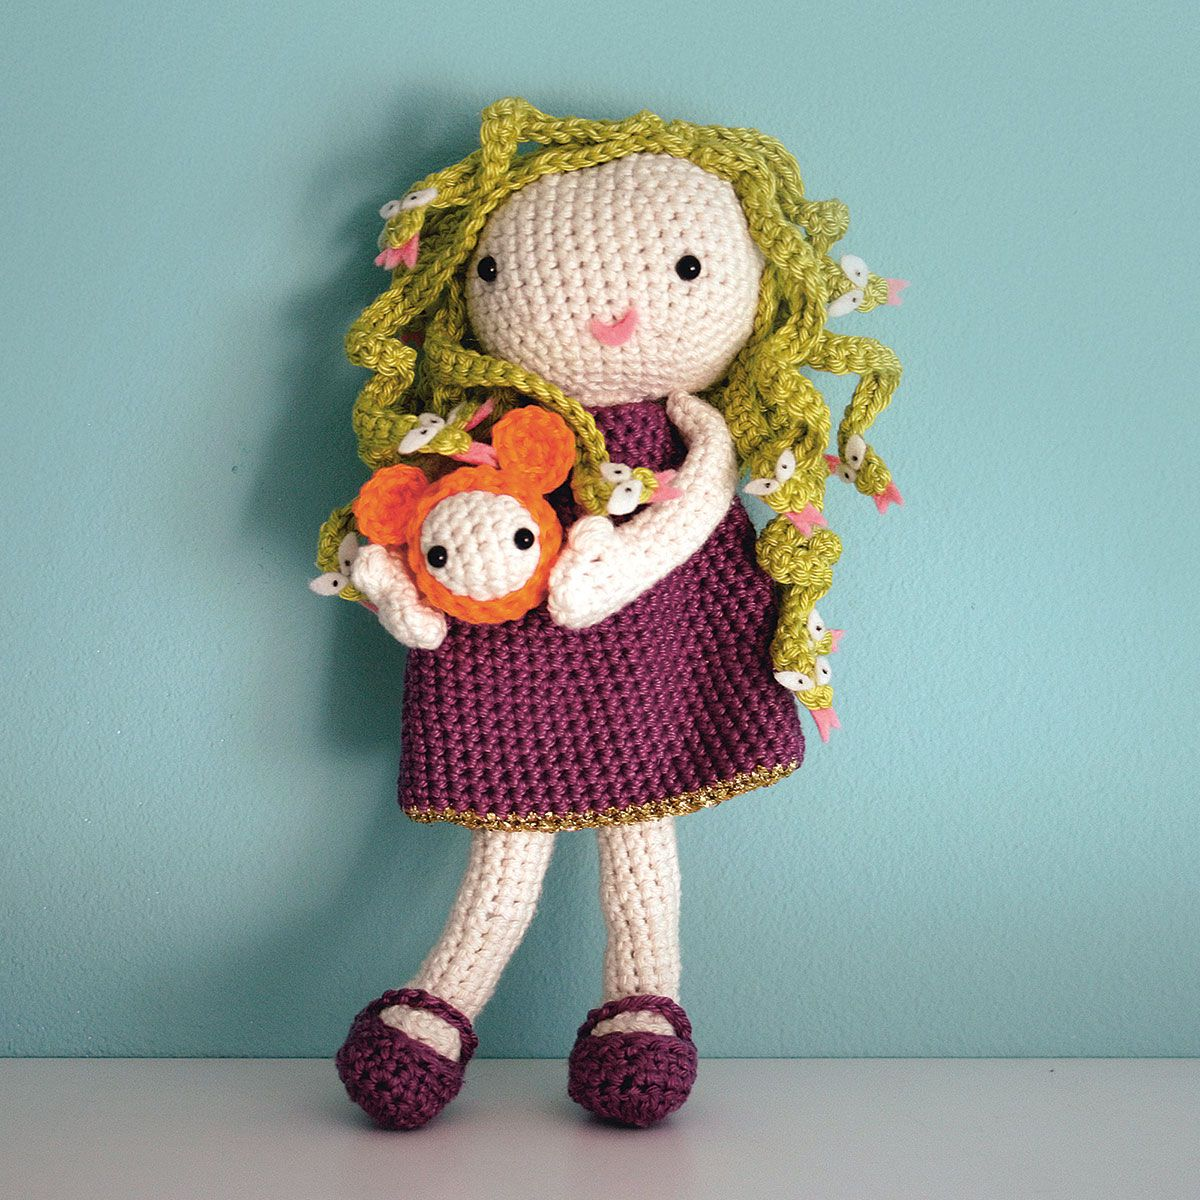 amigrurumi-halloween-medusa-and-monster-crochet-pattern-final2 ...